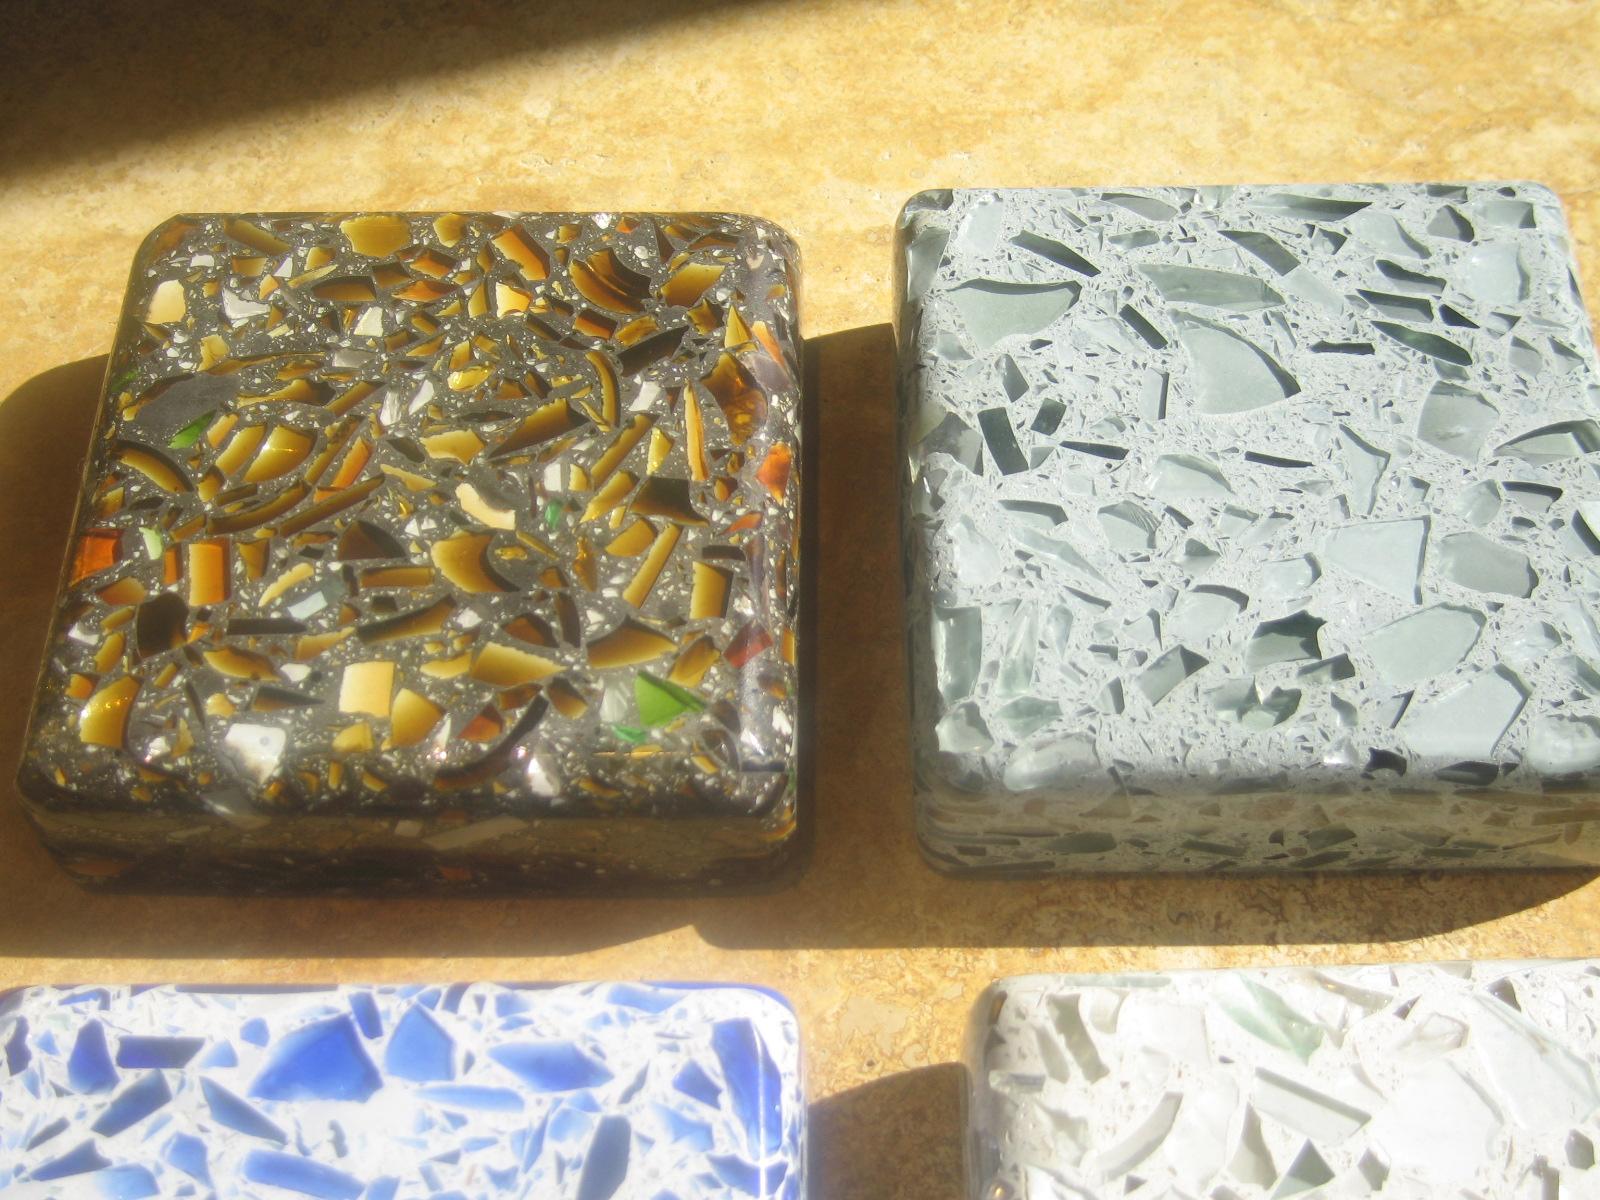 New Countertop Materials vetrazzo – new countertop material   gaspar's construction